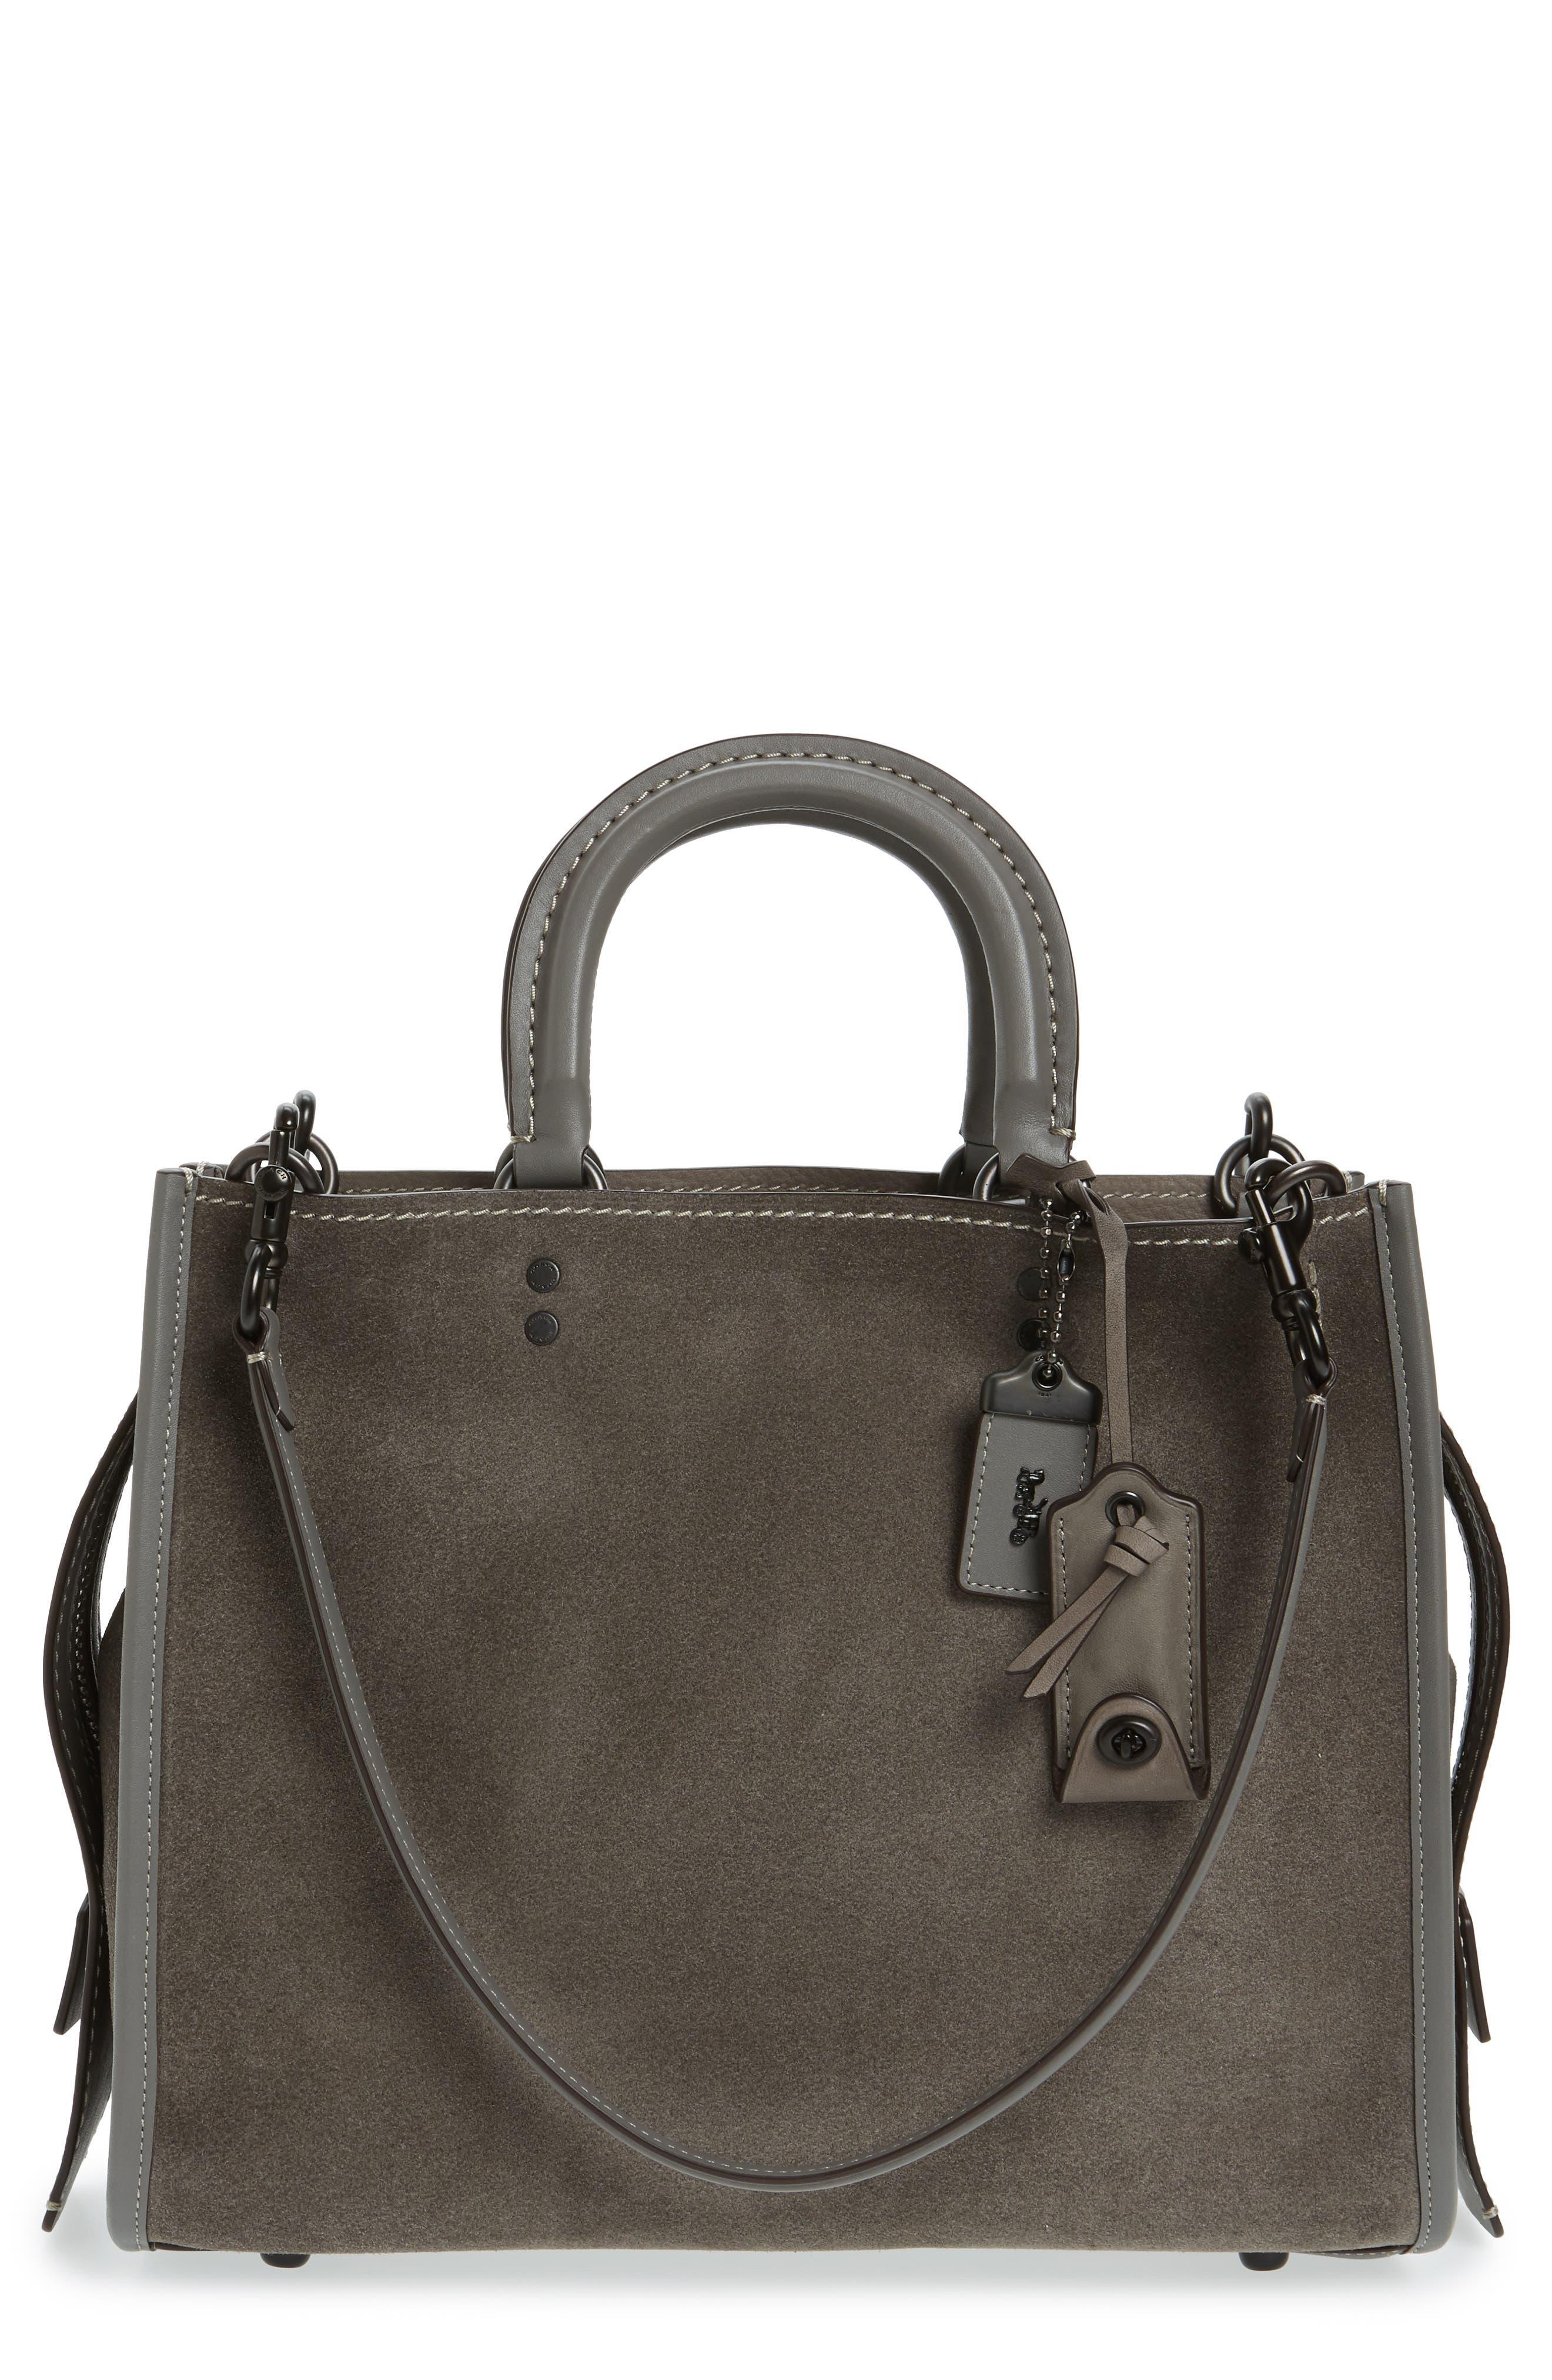 COACH 1941 'Rogue' Leather Satchel